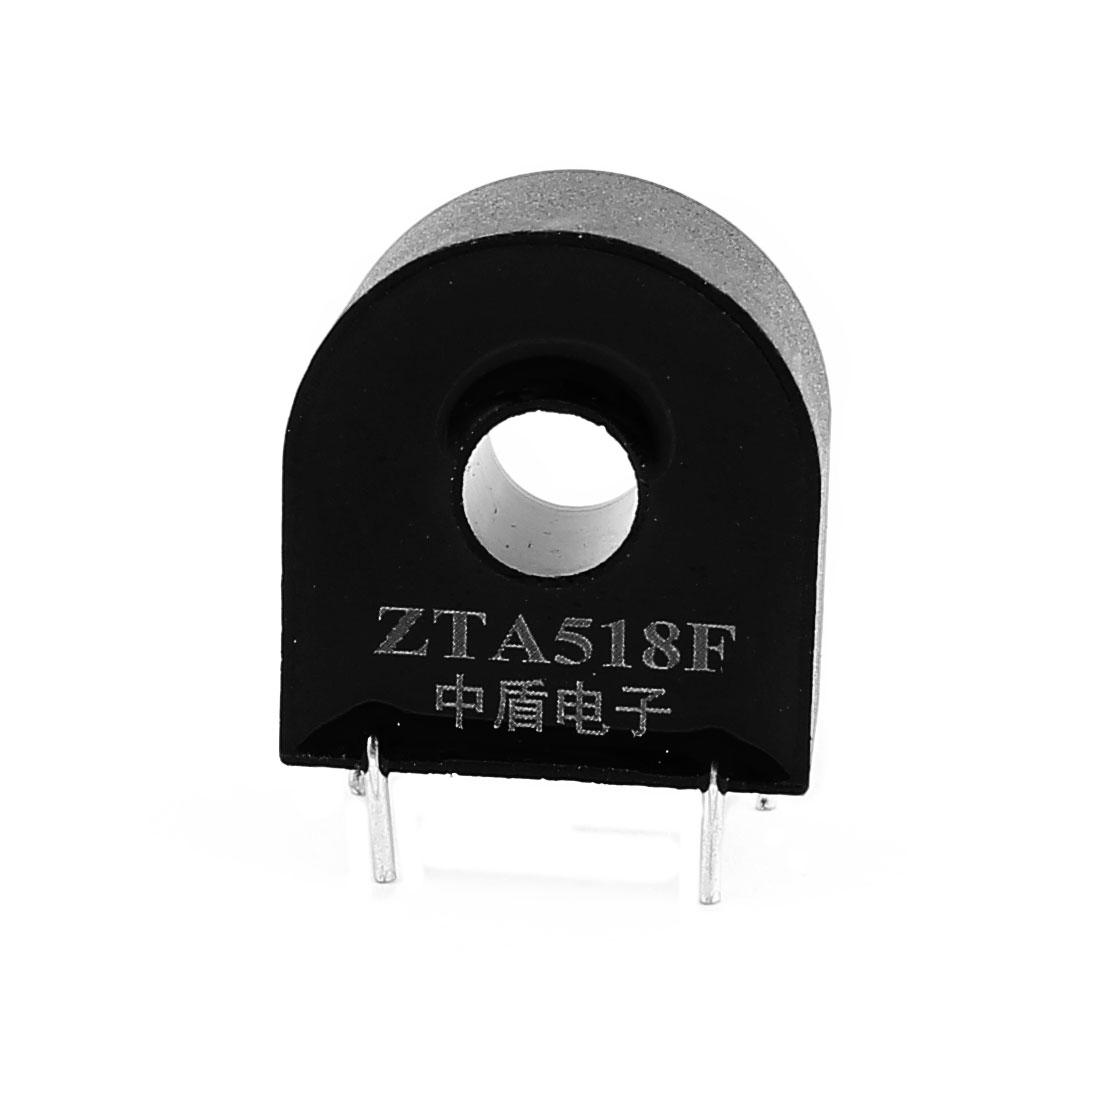 ZTA518F 20A/20mA 4 Terminal Precision AC Micro Current Transformer Sensor